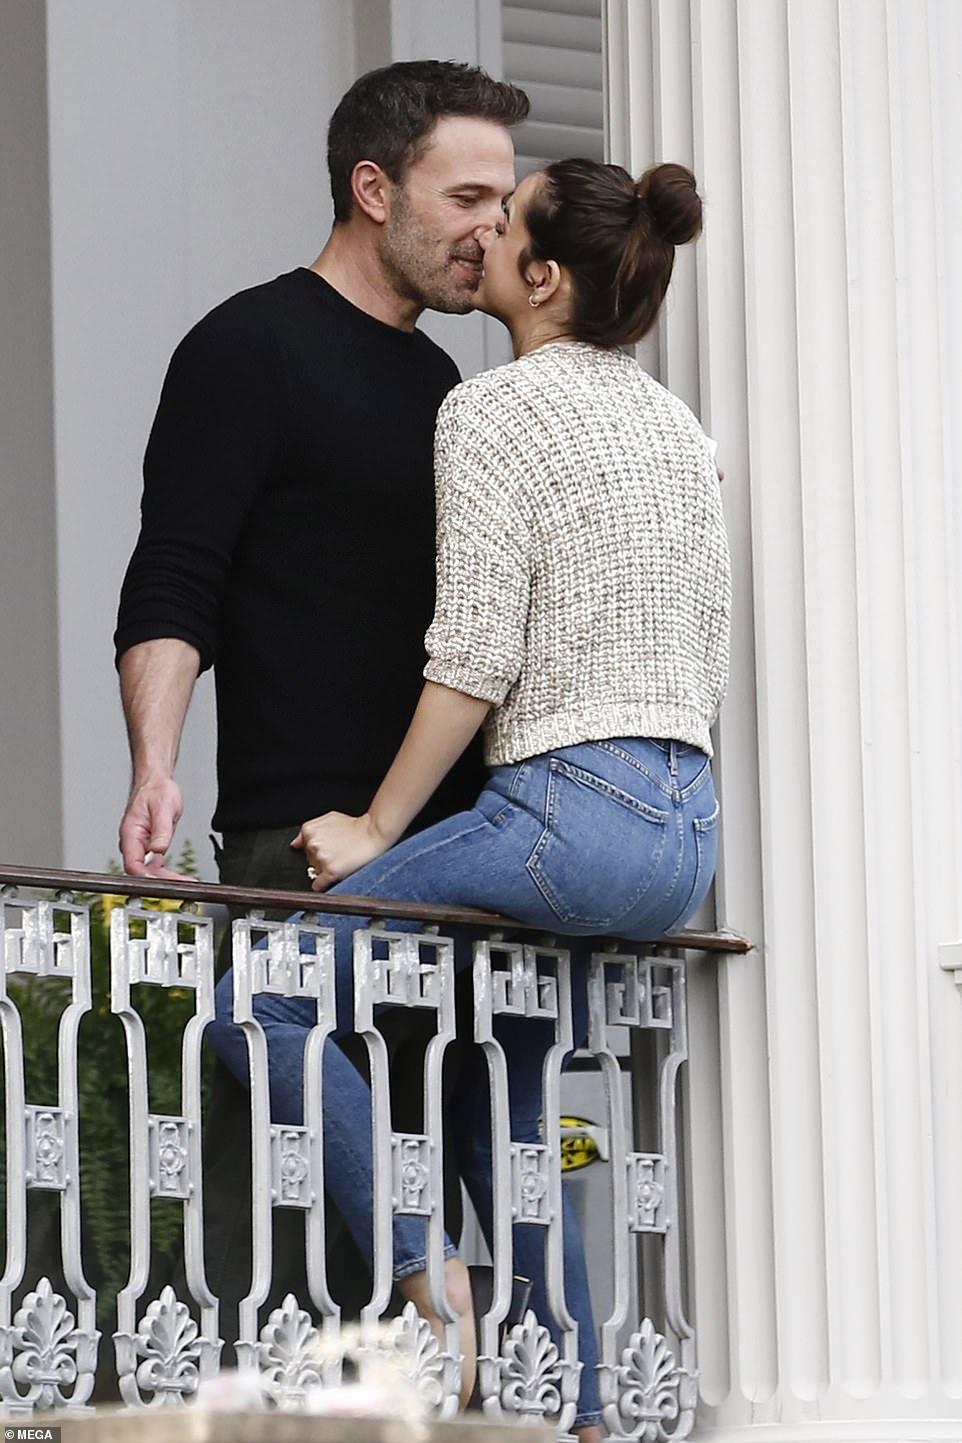 Ben Affleck and Ana de Armas put on a VERY amorous display as they reunite on set